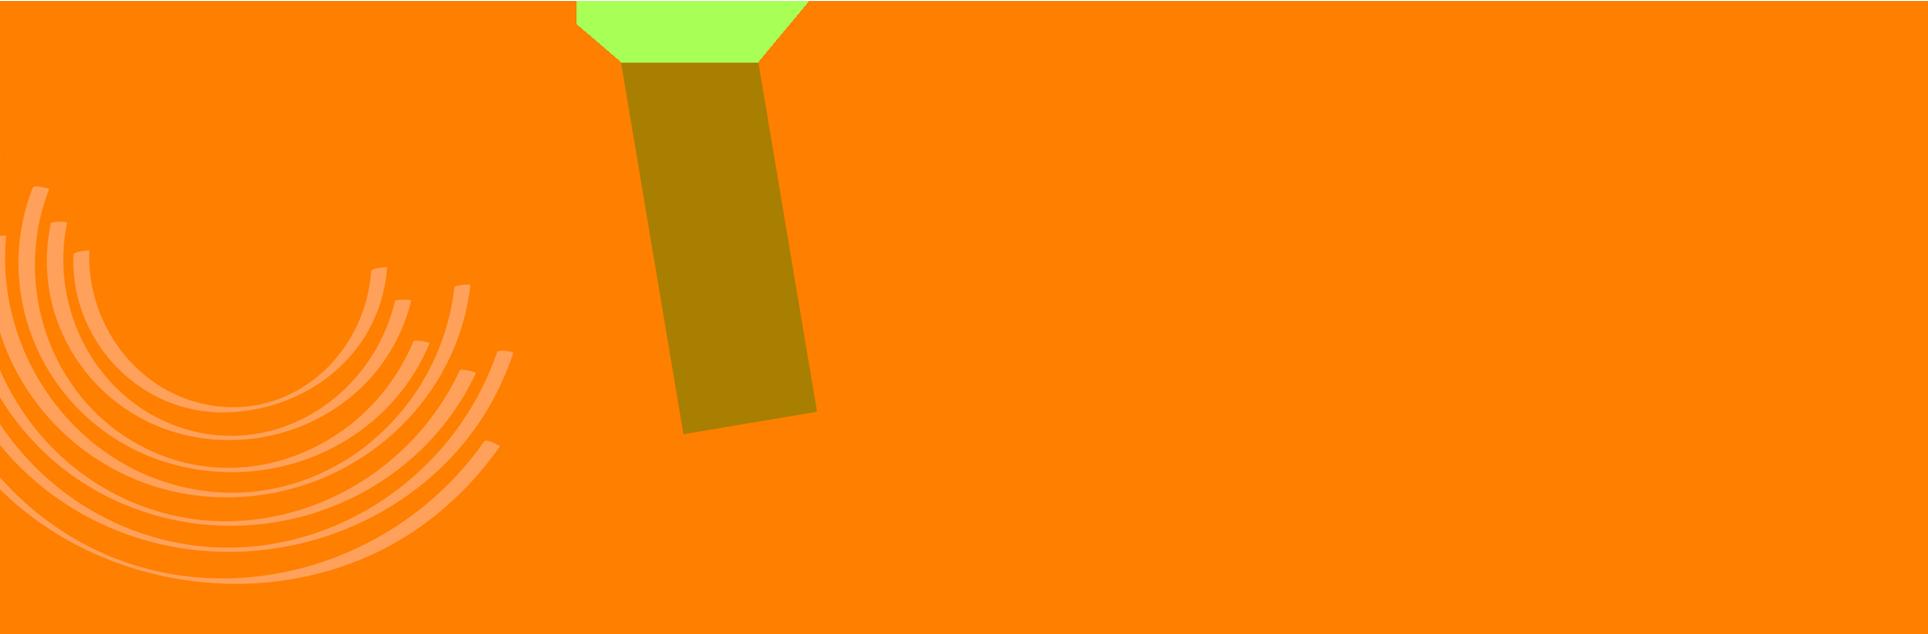 rettangolo02